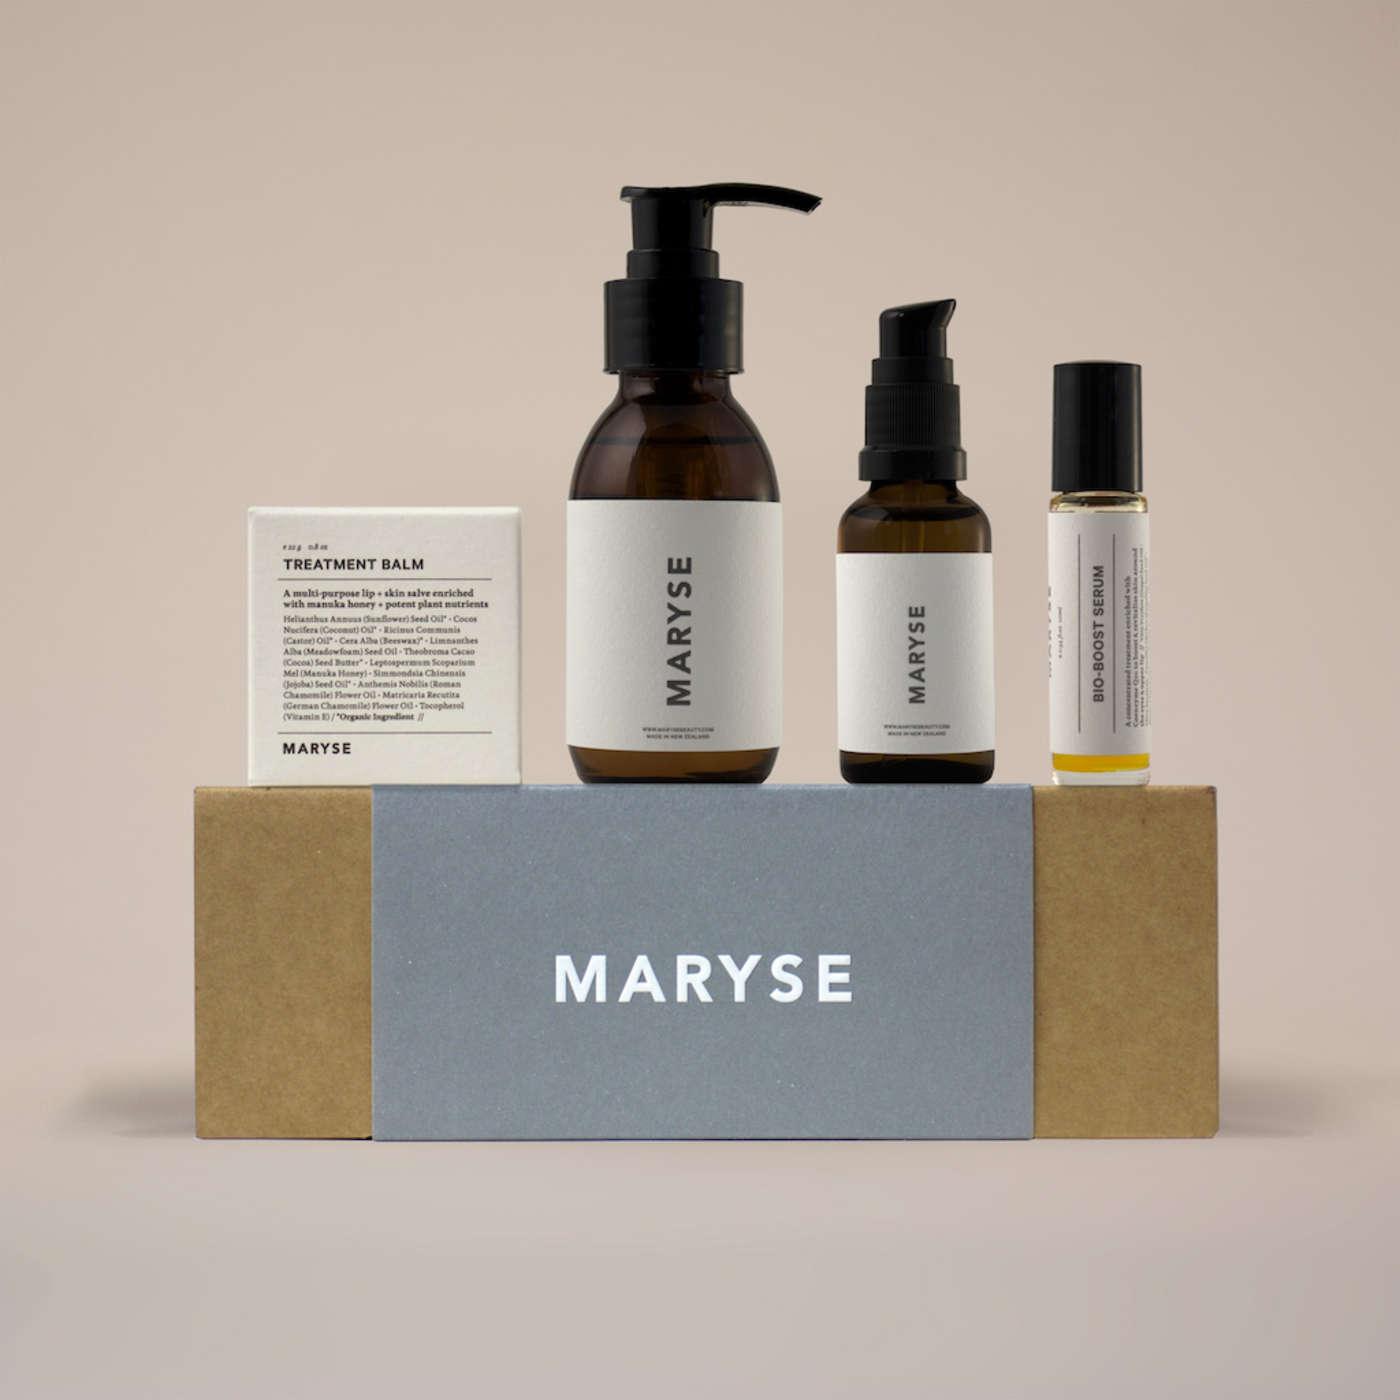 MARYSE Beauty Skincare